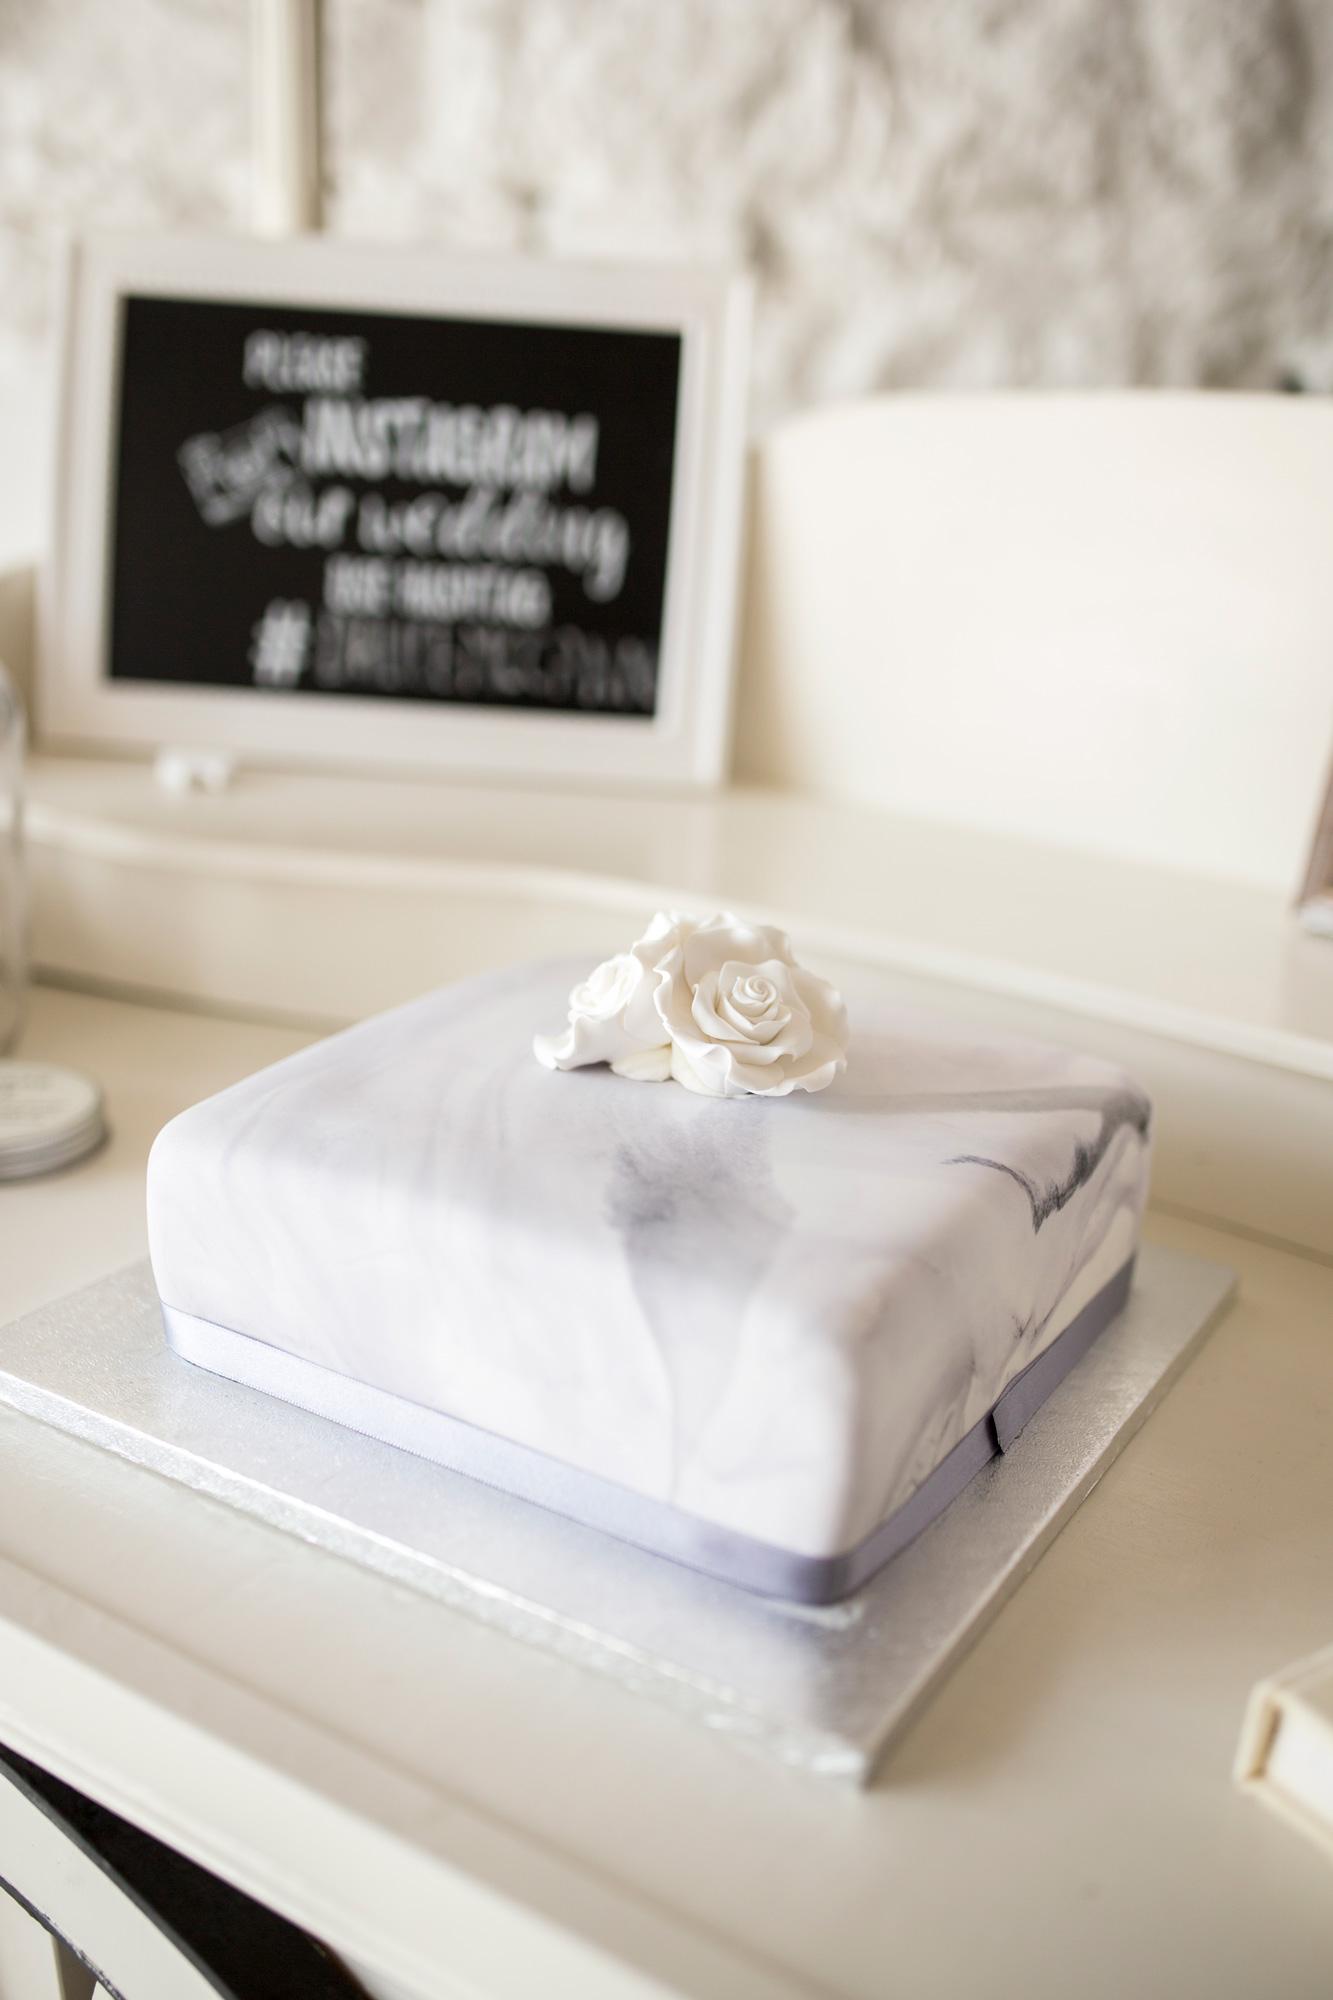 Marble Cake, Pastel Cake, Lavender Cake, Buckinghamshire Wedding,